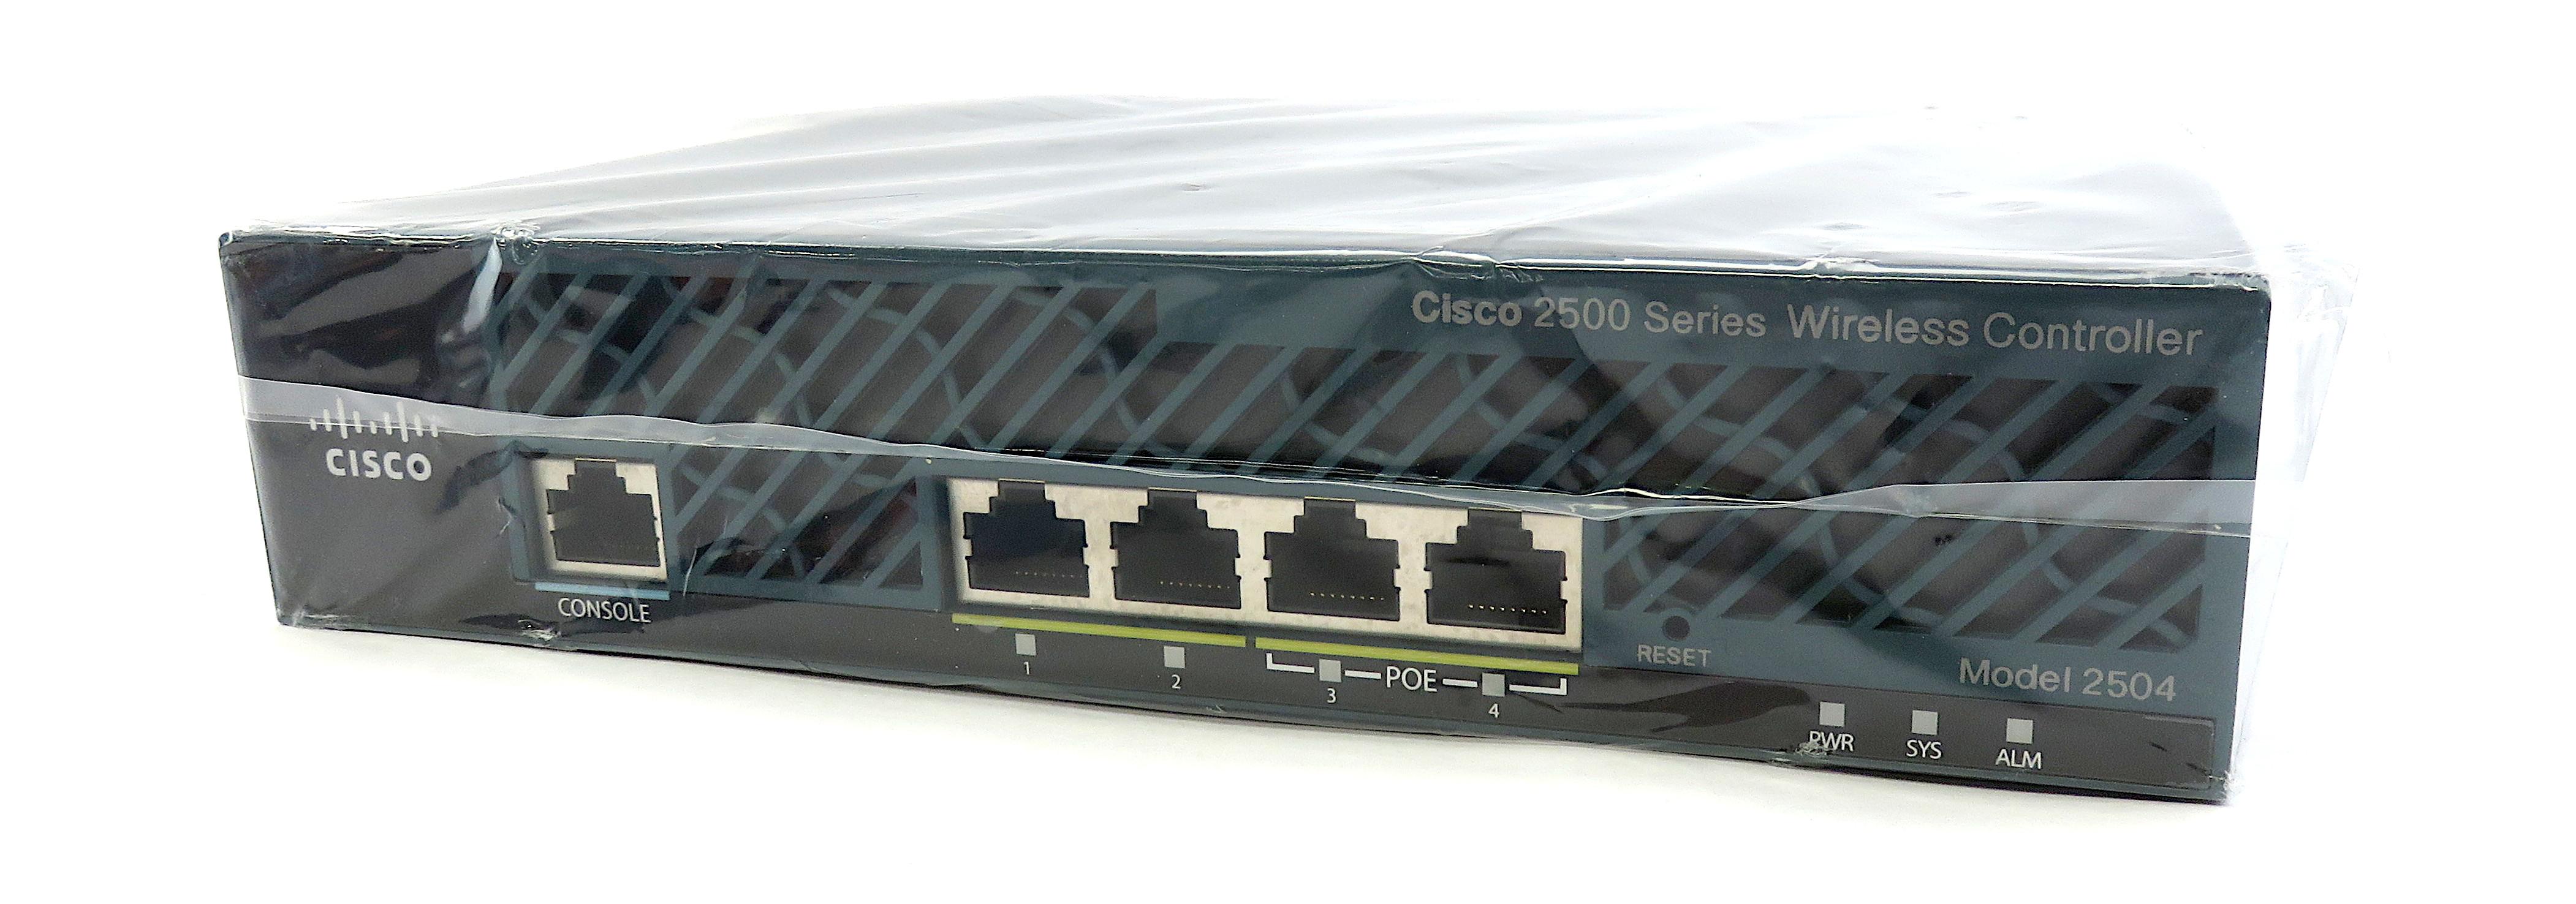 Cisco 2504 Wireless Controller AIR-CT2504-K9 + 50 AP Licenses: AIR-CT2504-50-K9